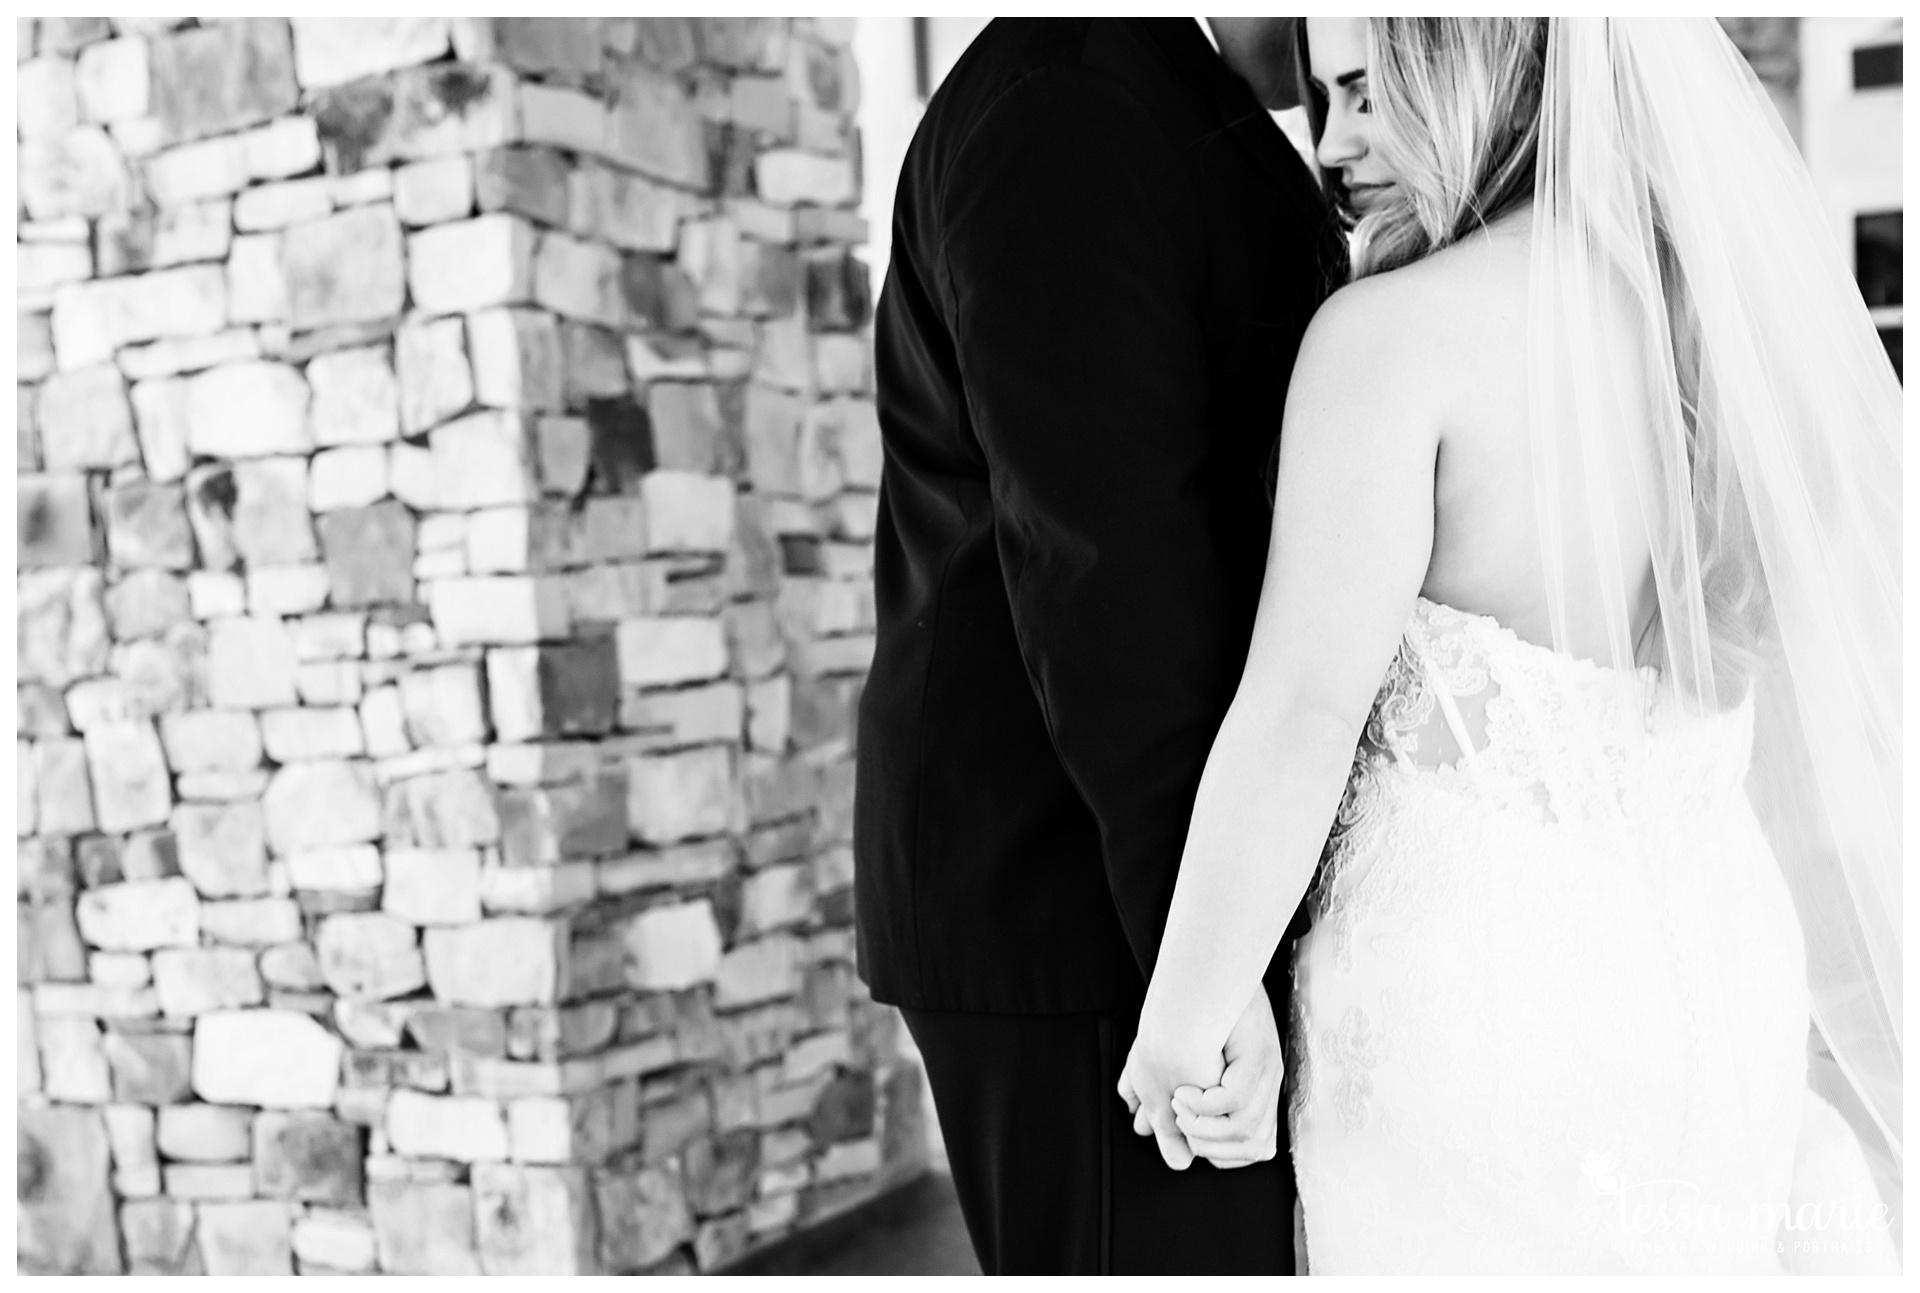 tessa_marie_weddings_legacy_story_focused_wedding_pictures_atlanta_wedding_photographer_0088